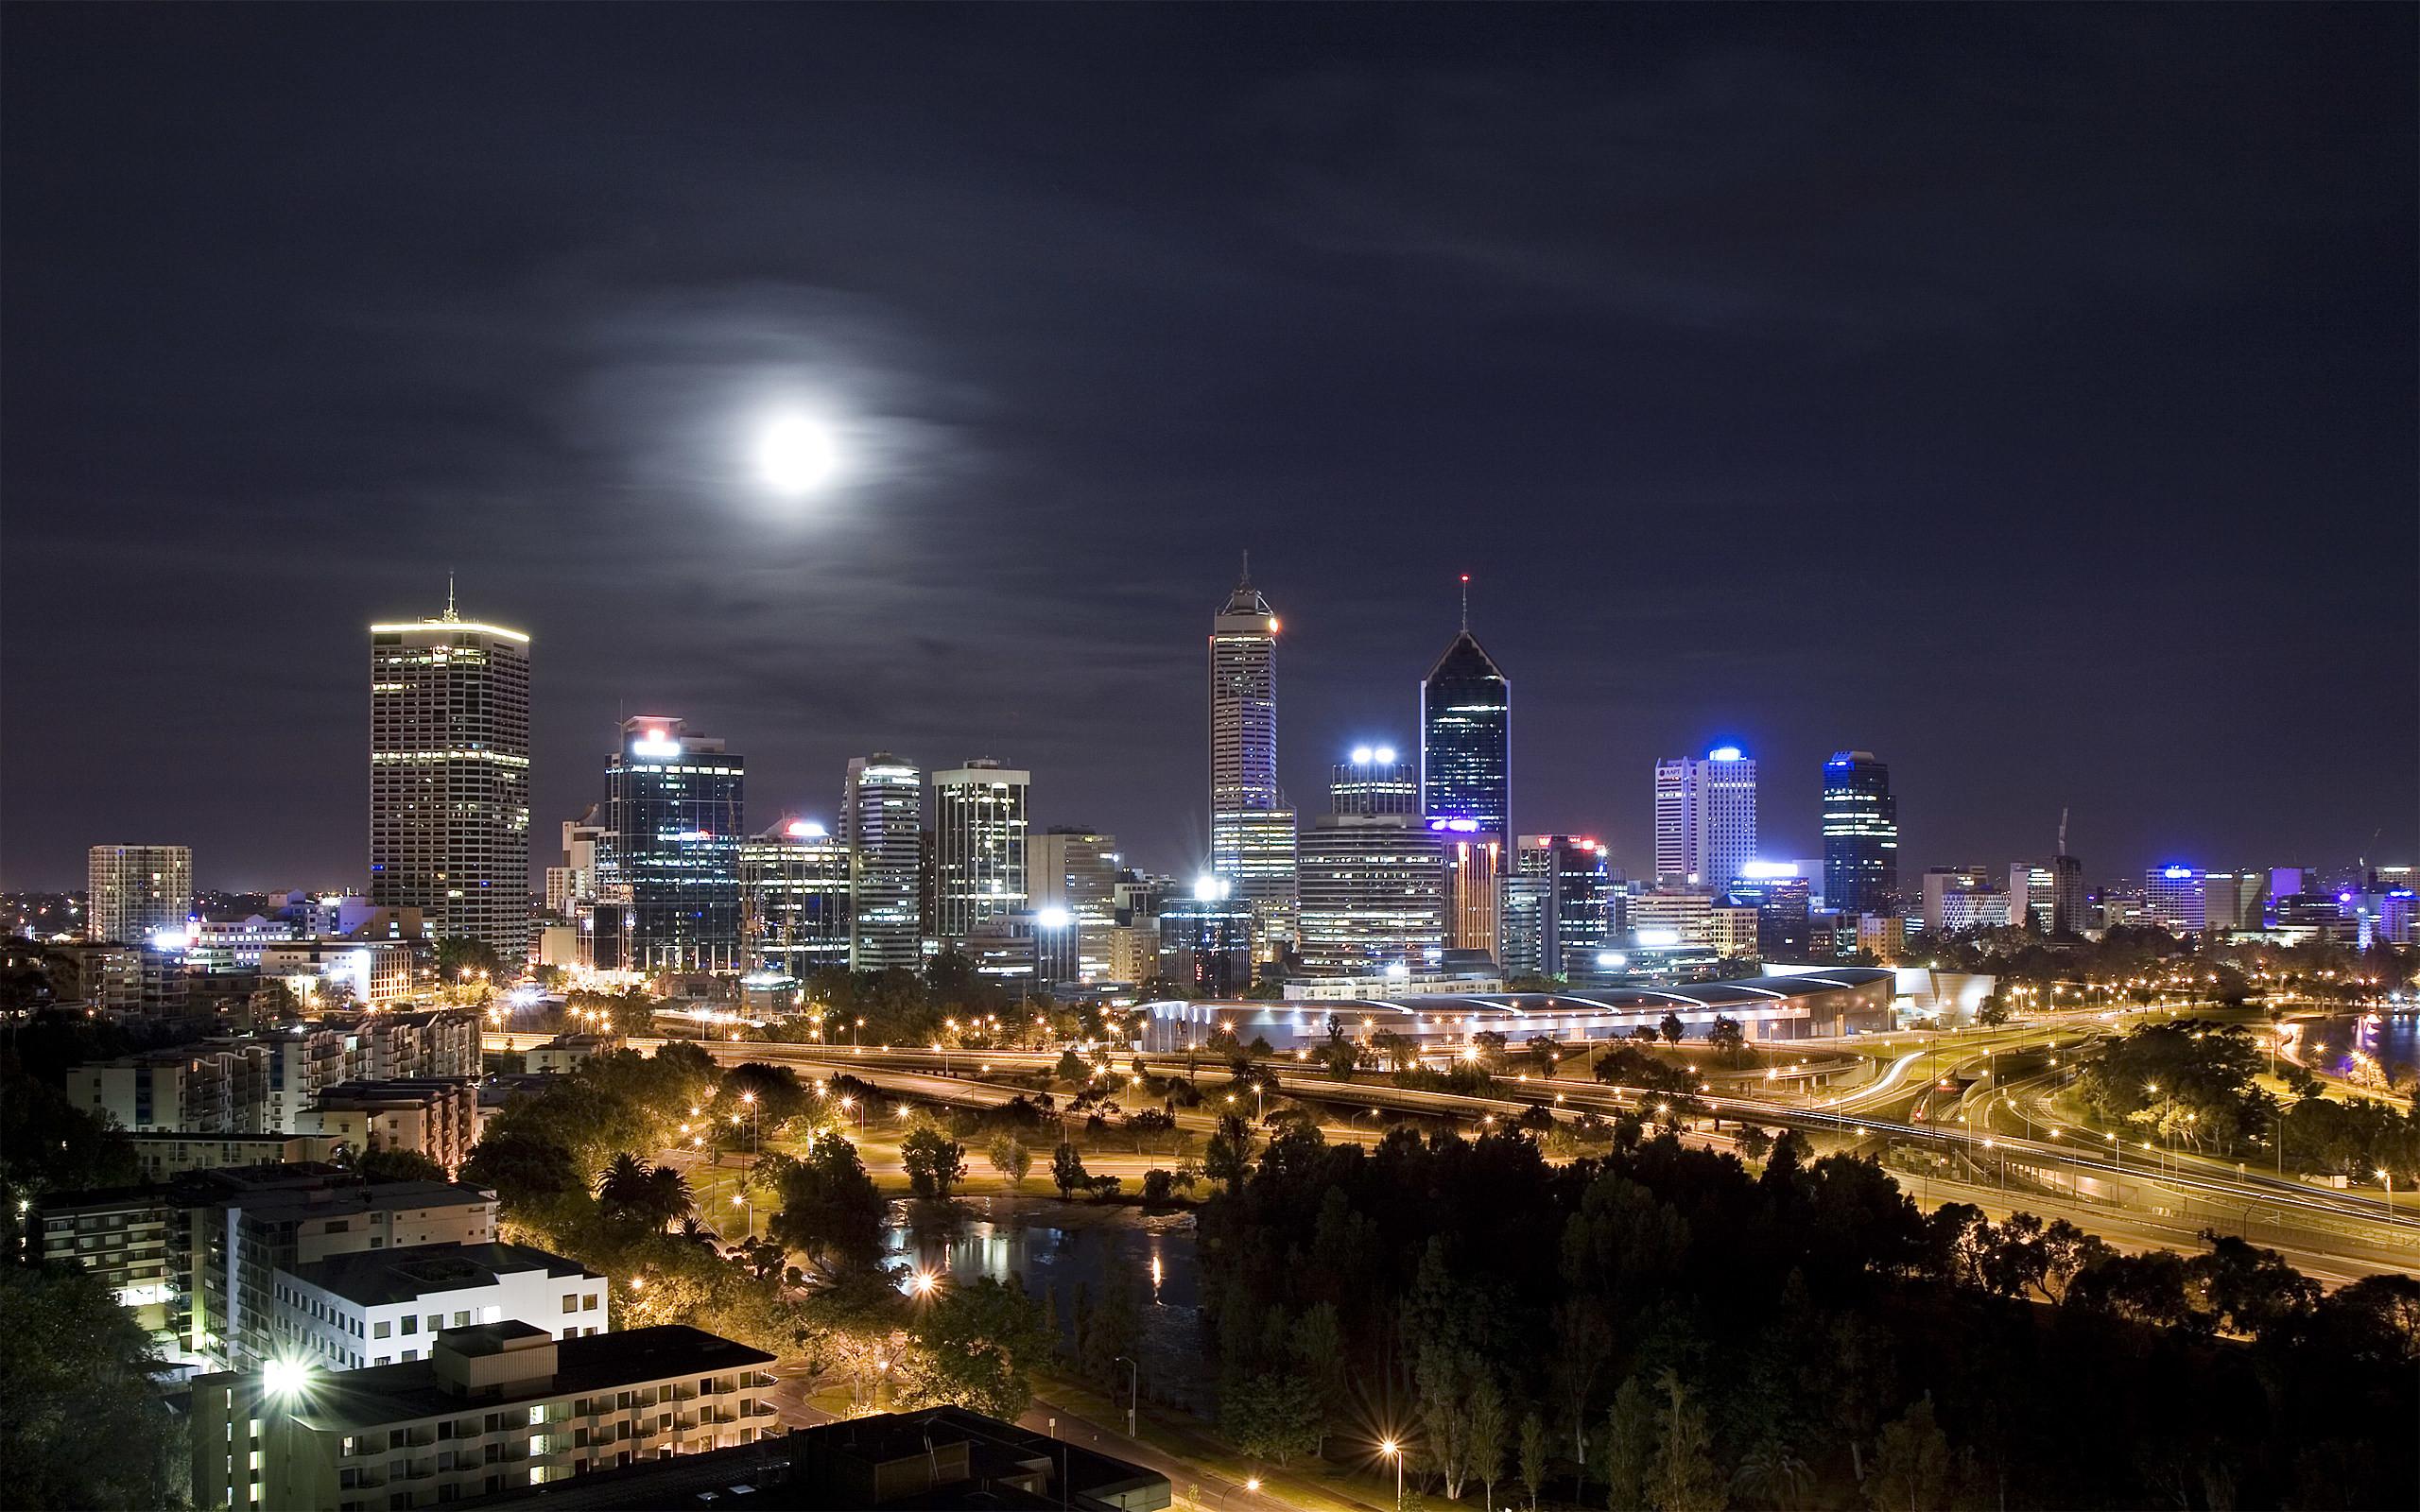 Amazing City Night Wallpaper 2560x1600 2560x1600